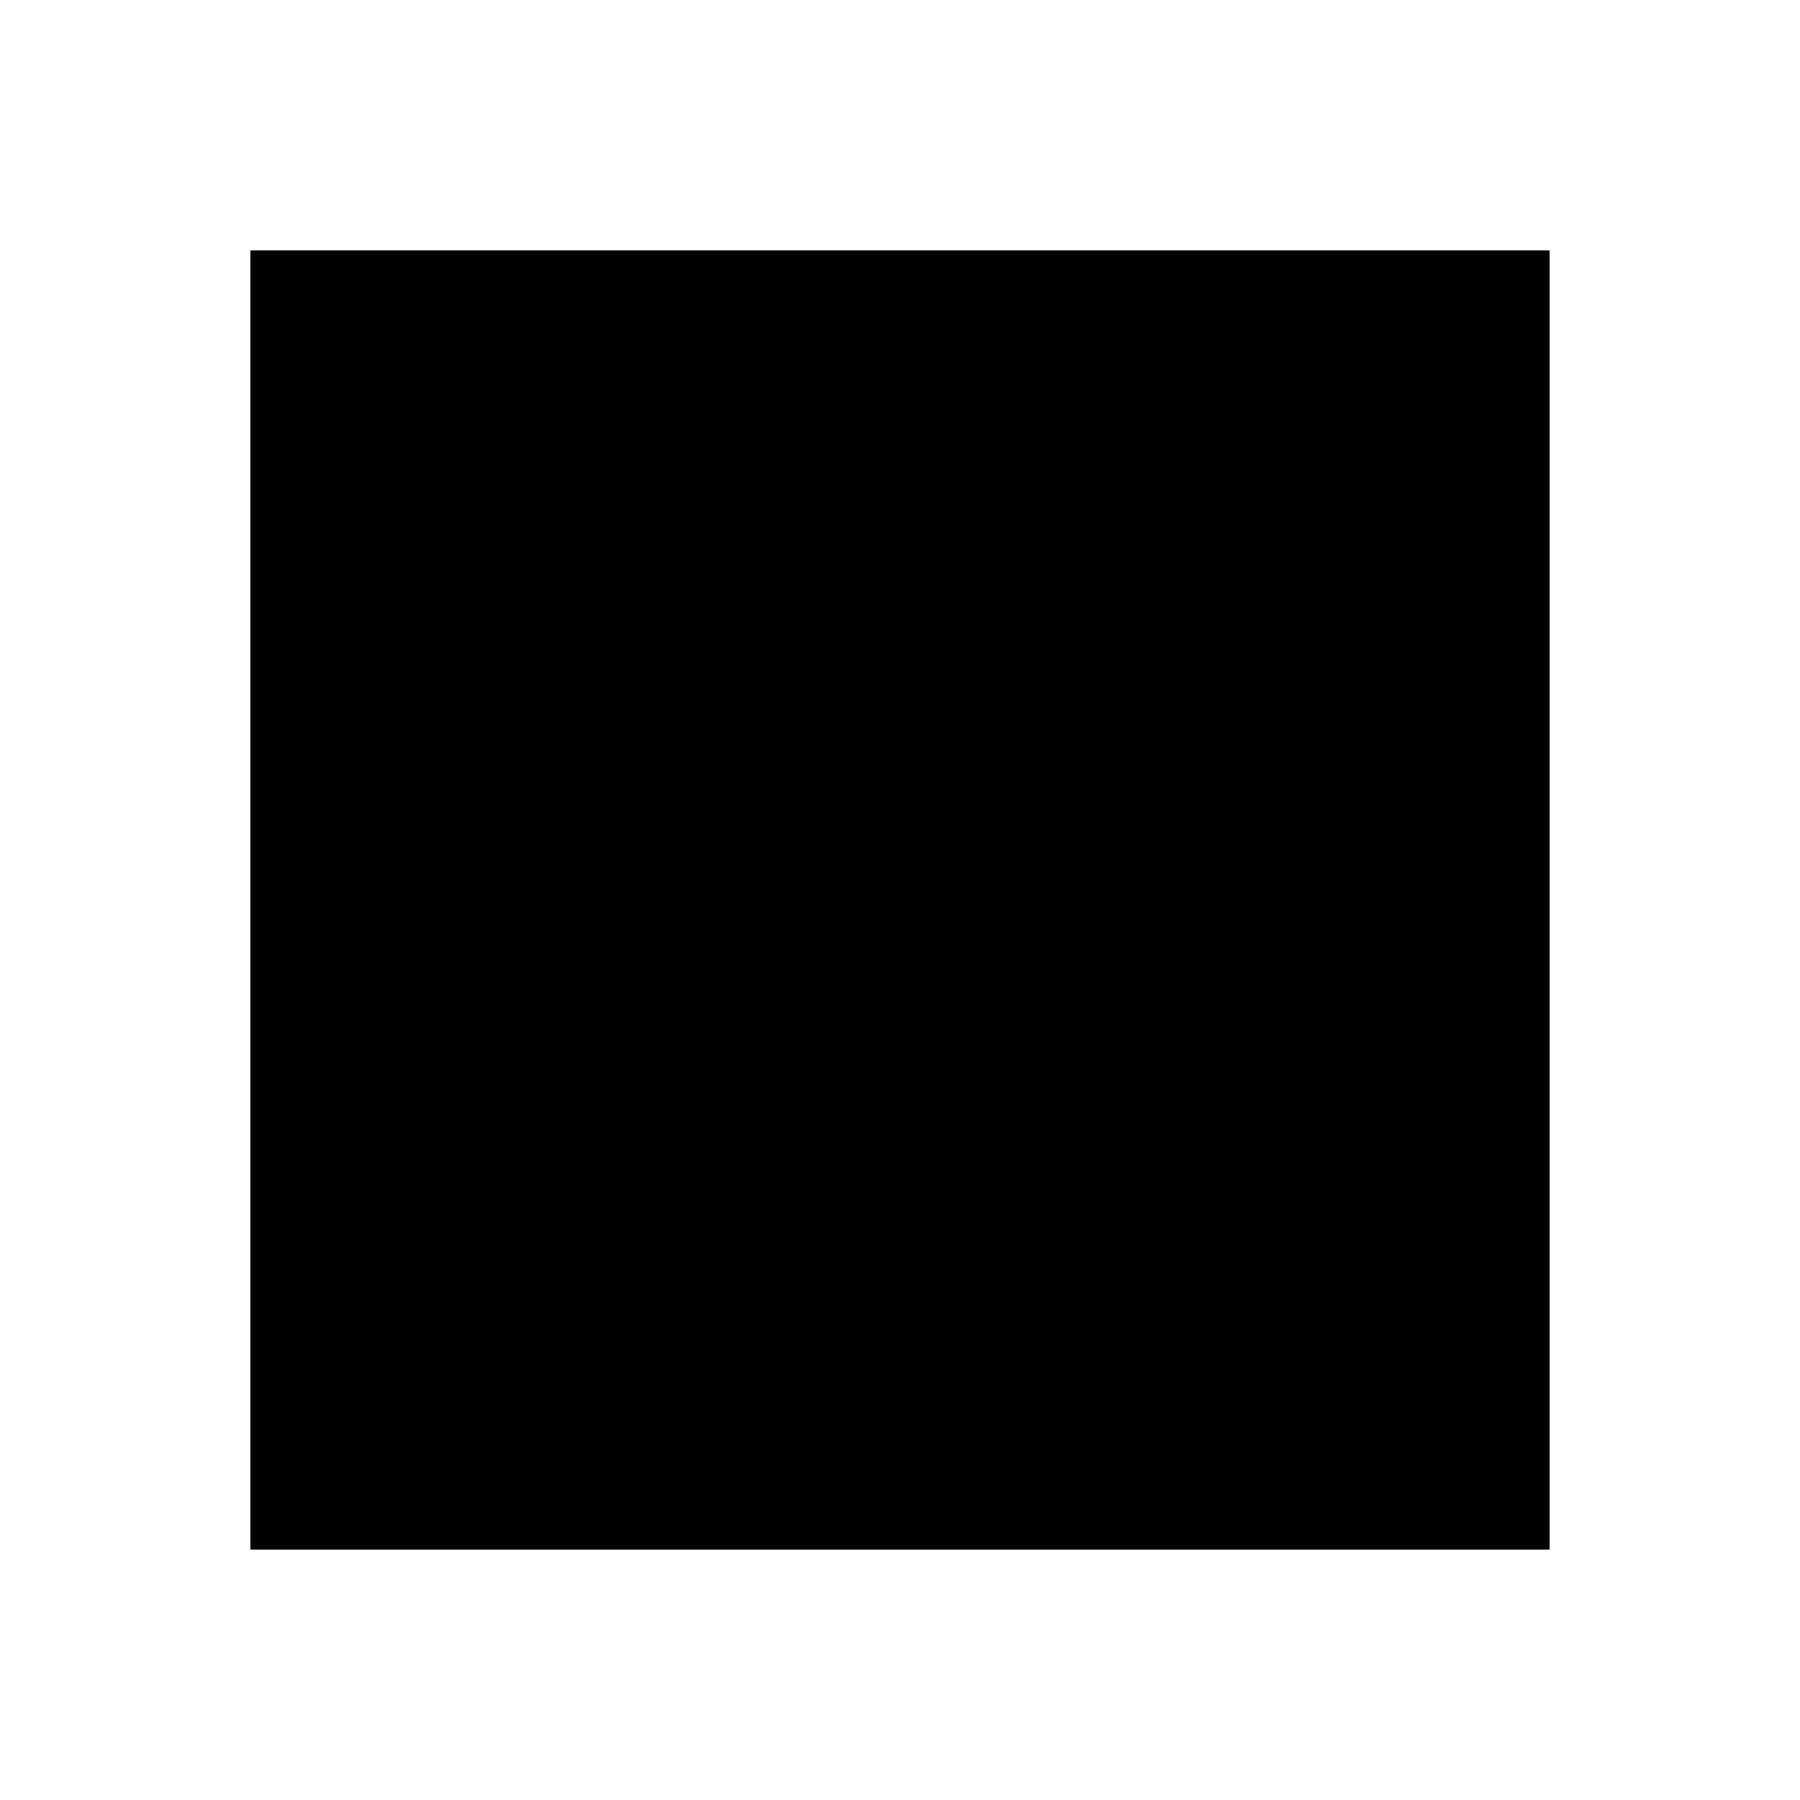 Vinilo termotranferible Brick® 600, hoja 30x50 cm Negro